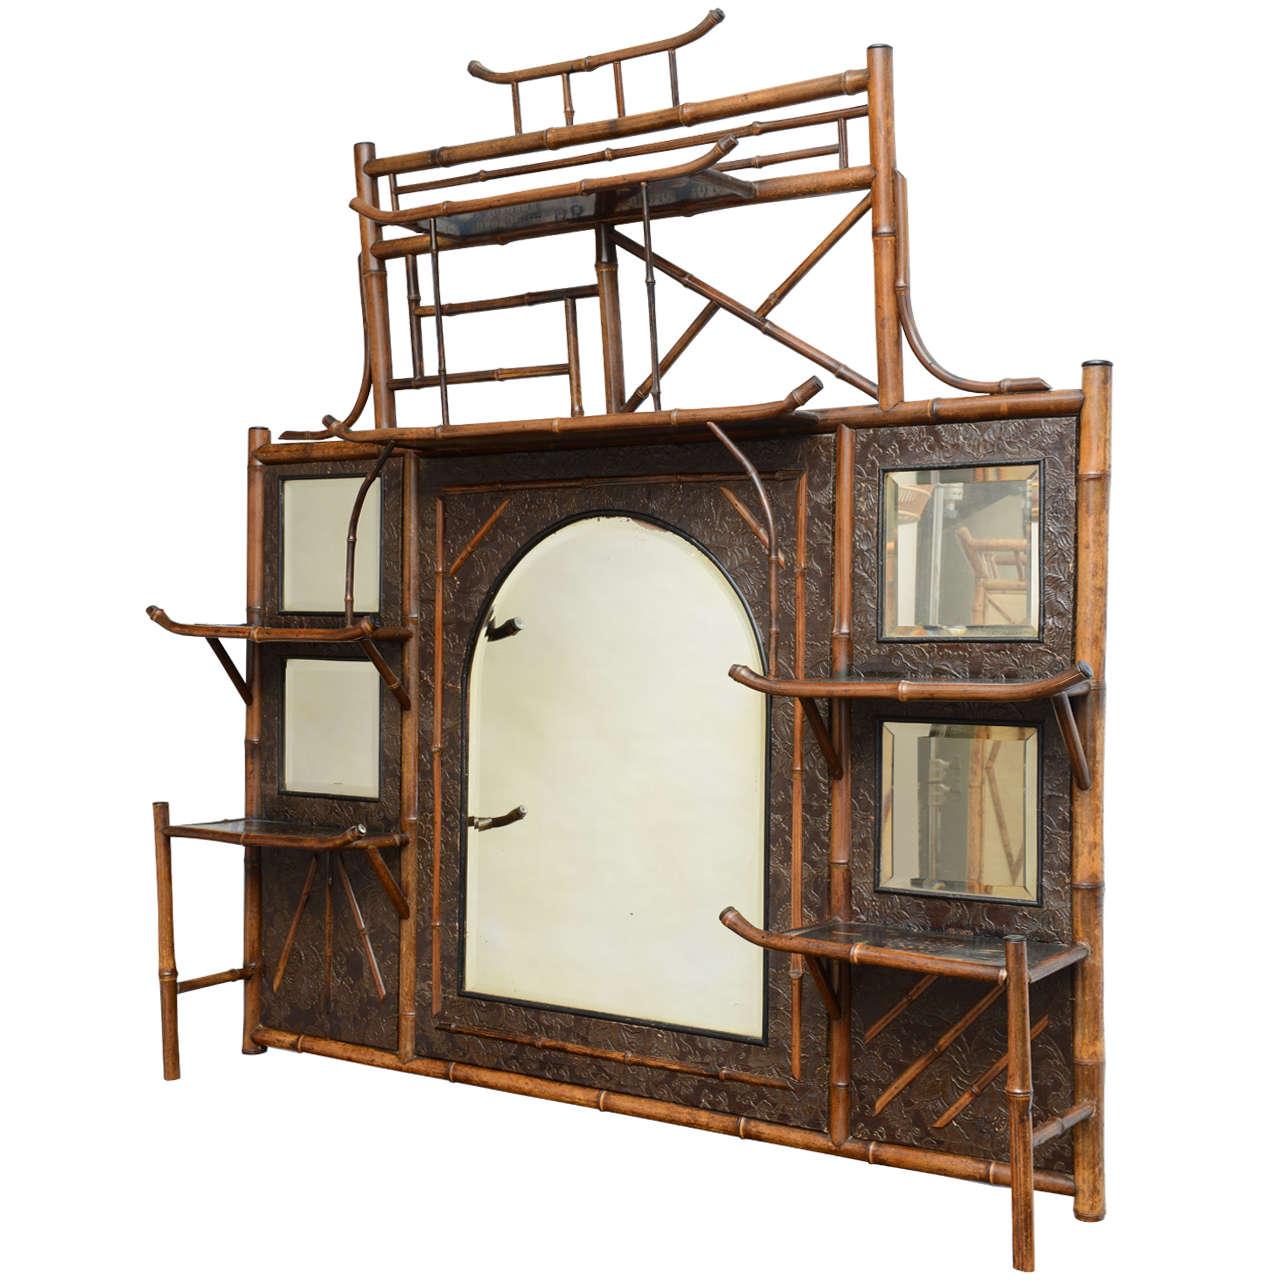 rare 19th century english bamboo mirror and shelf unit 1